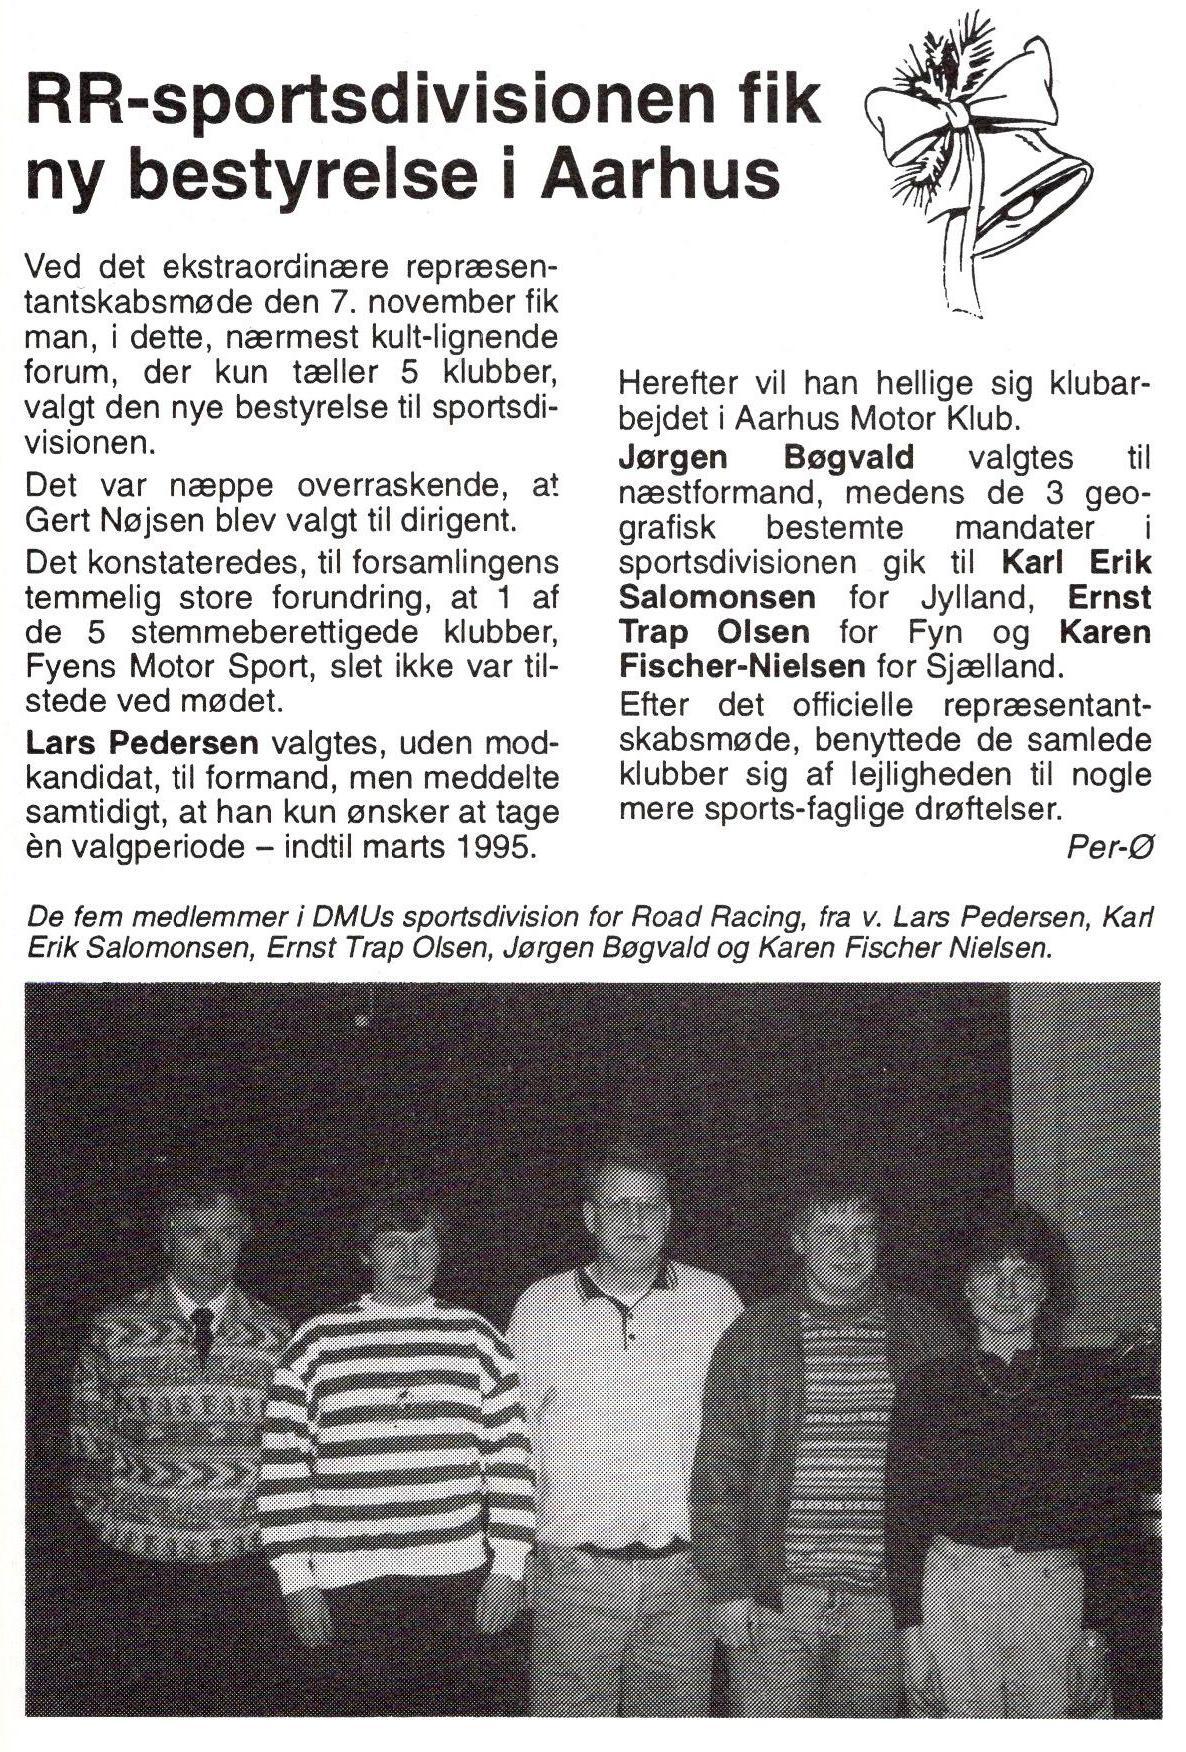 1993 - RR-sportsdivisionens bestyrelse i den nye struktur.